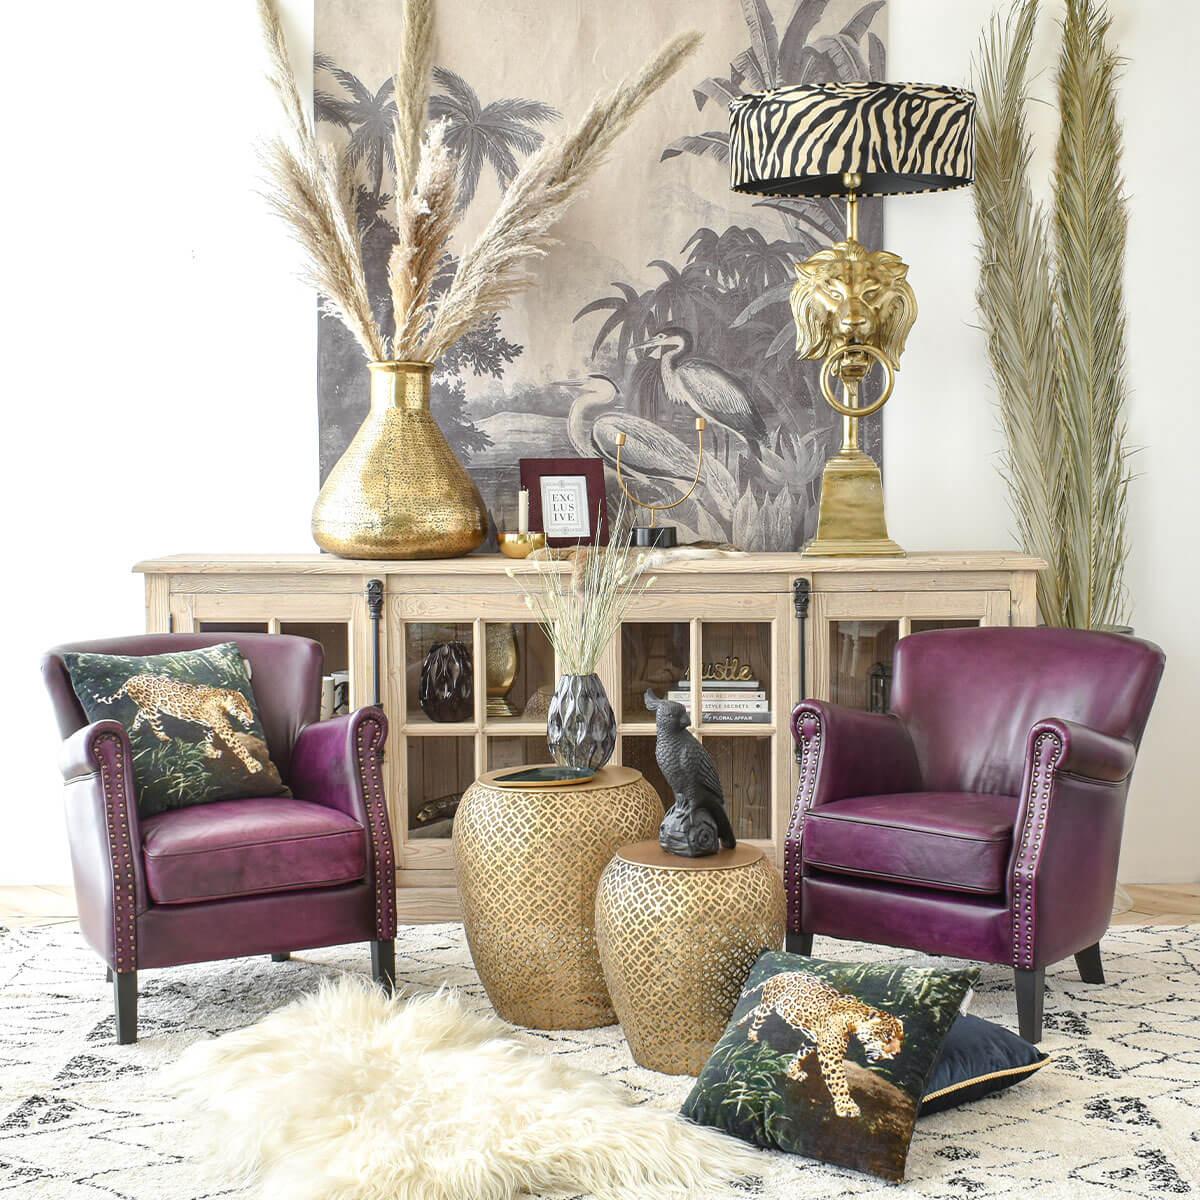 artem-sideboard-cozy-home-dubai